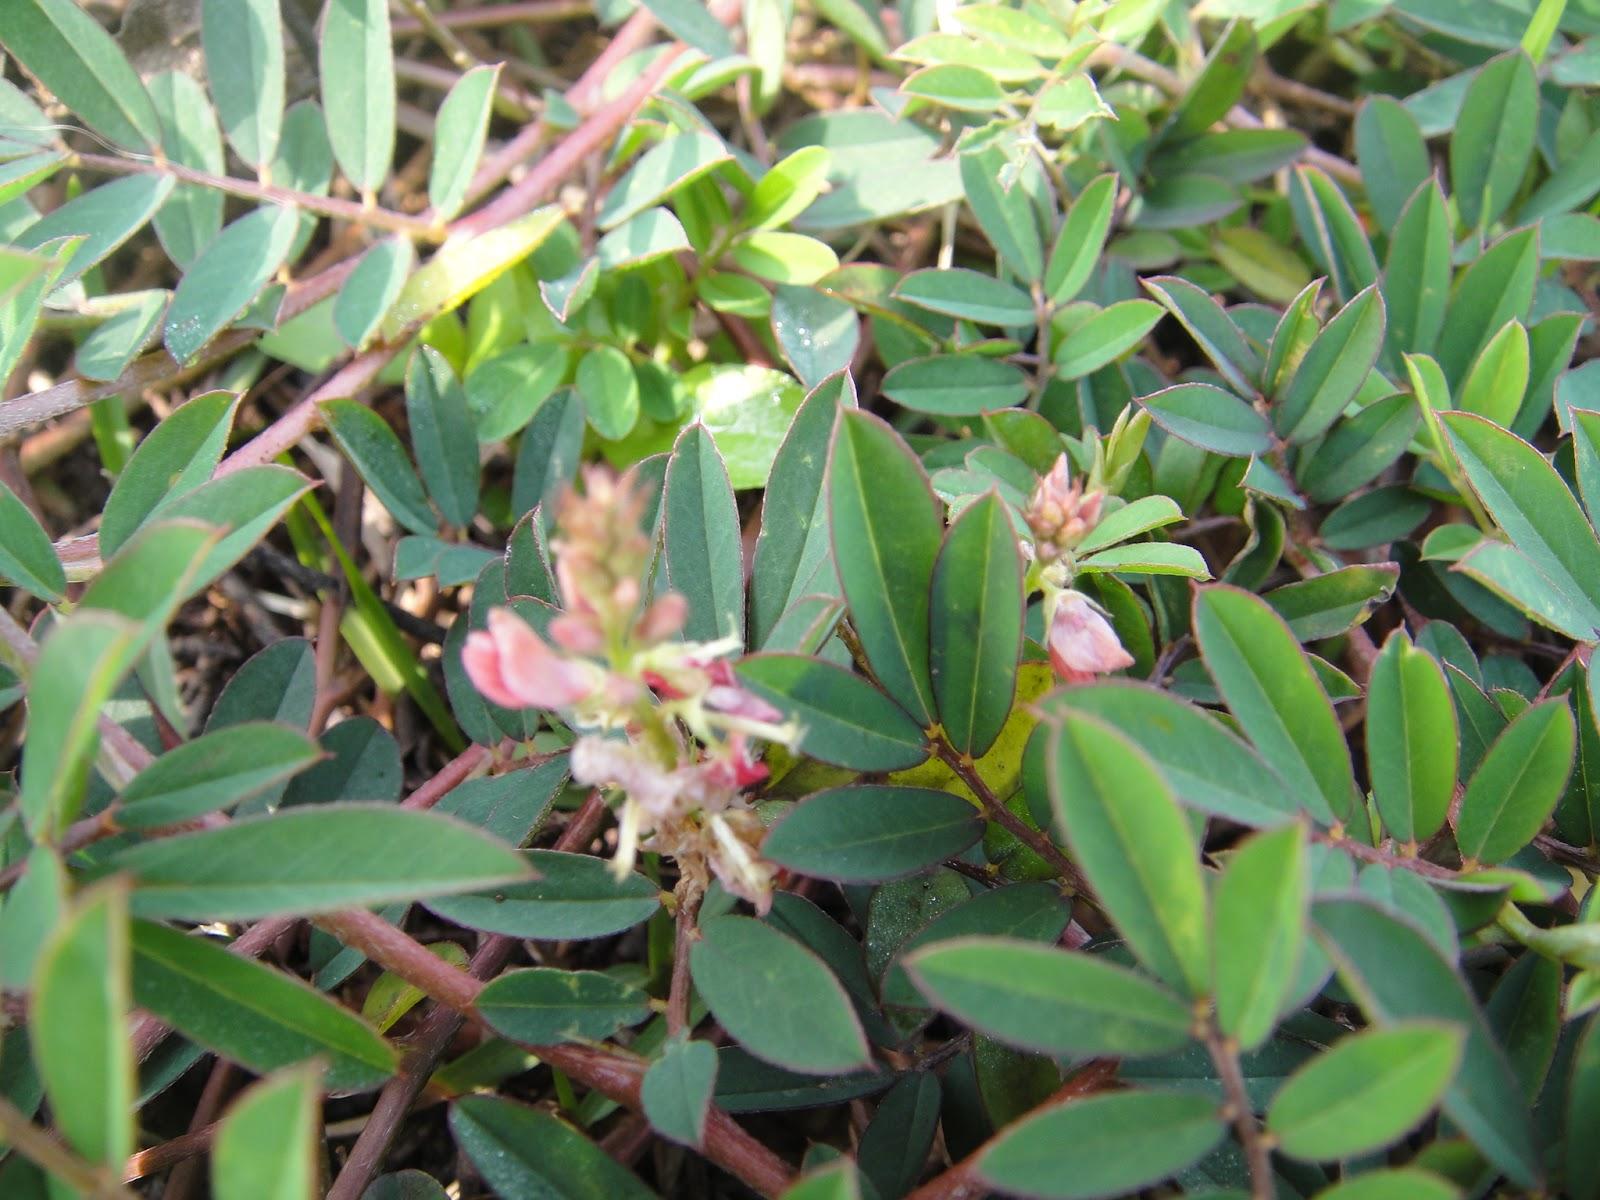 DWAN雲之端: 穗花木藍--一串長長的橘紅色花序的穗花木藍是臺灣的原生地被植物;開闊的荒地或草地多陽光的 ...